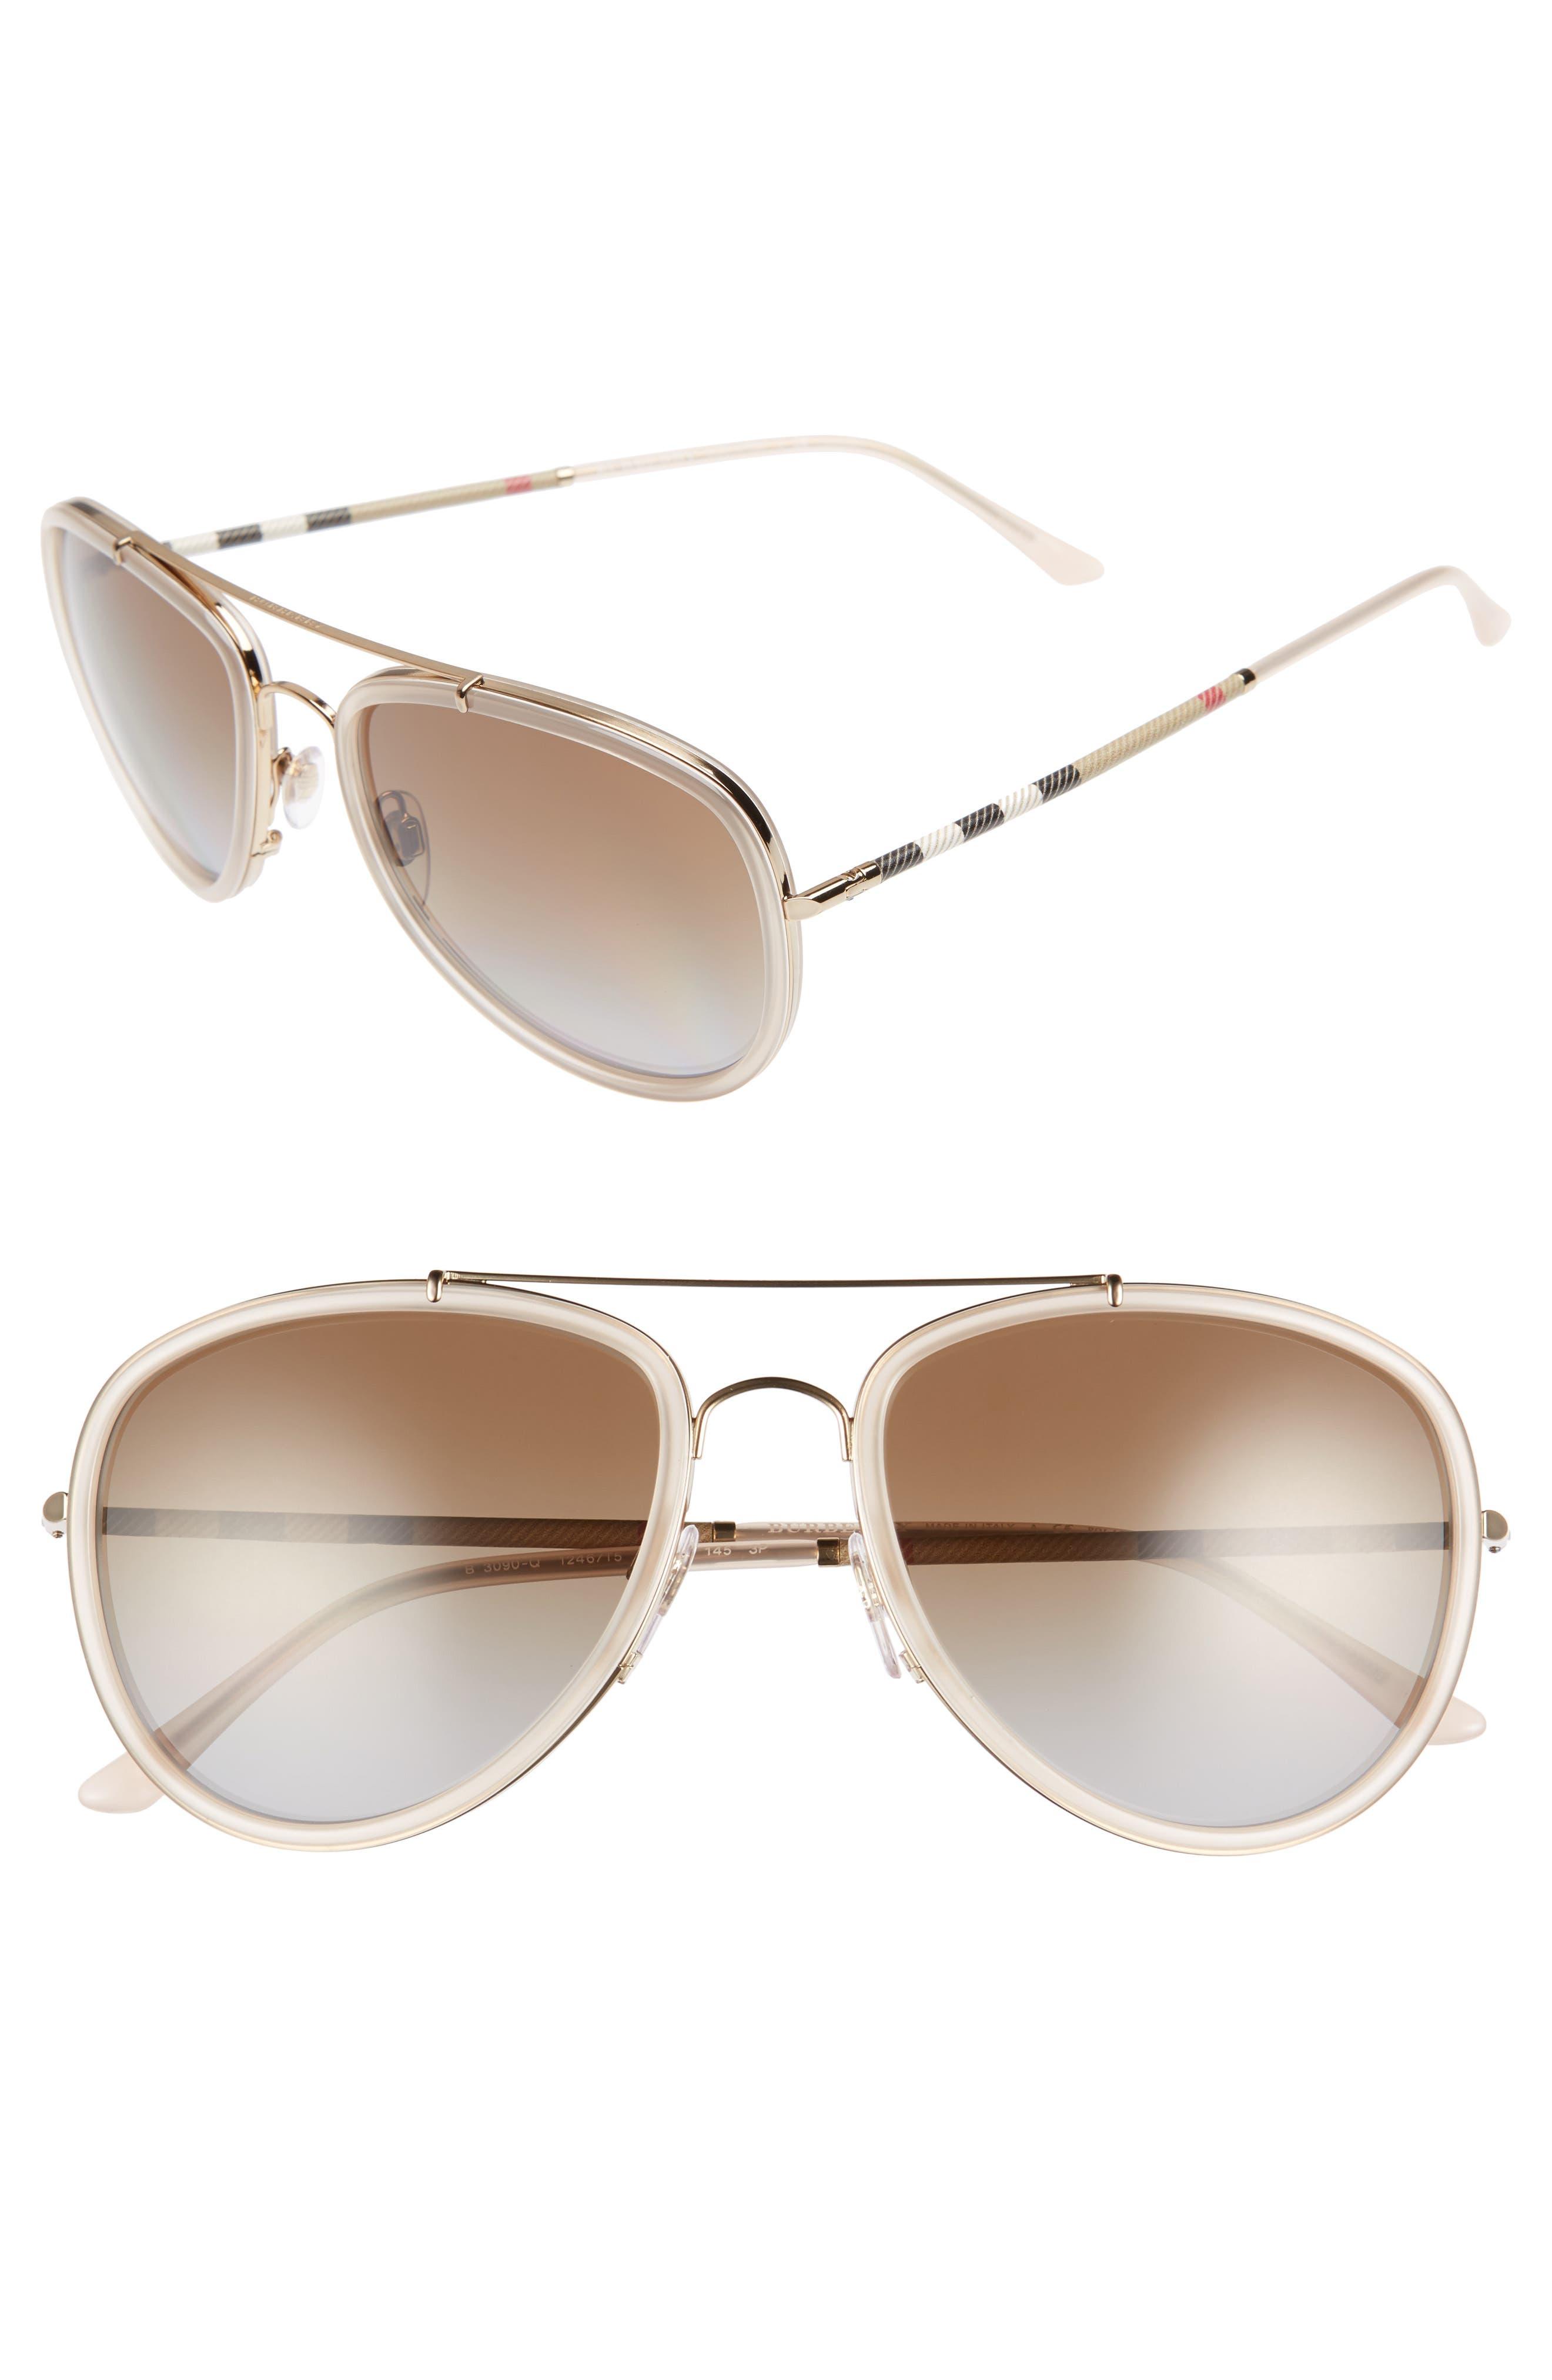 Alternate Image 1 Selected - Burberry 58mm Check Temple Pilot Sunglasses